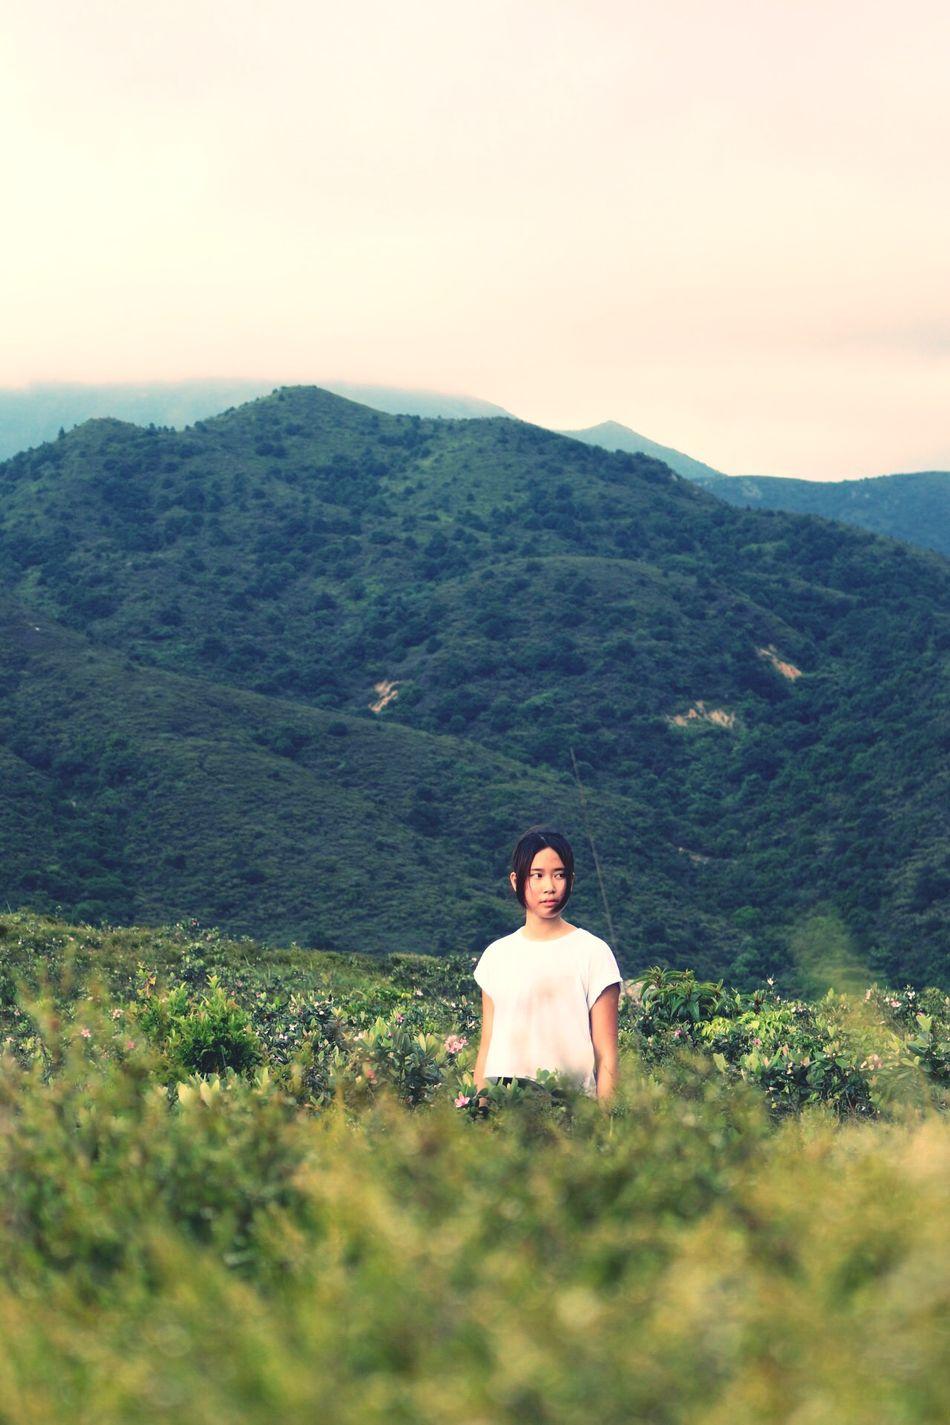 Japangirl Focus Enjoying Life Check This Out Hi! Hello World The Great Outdoors - 2015 EyeEm Awards